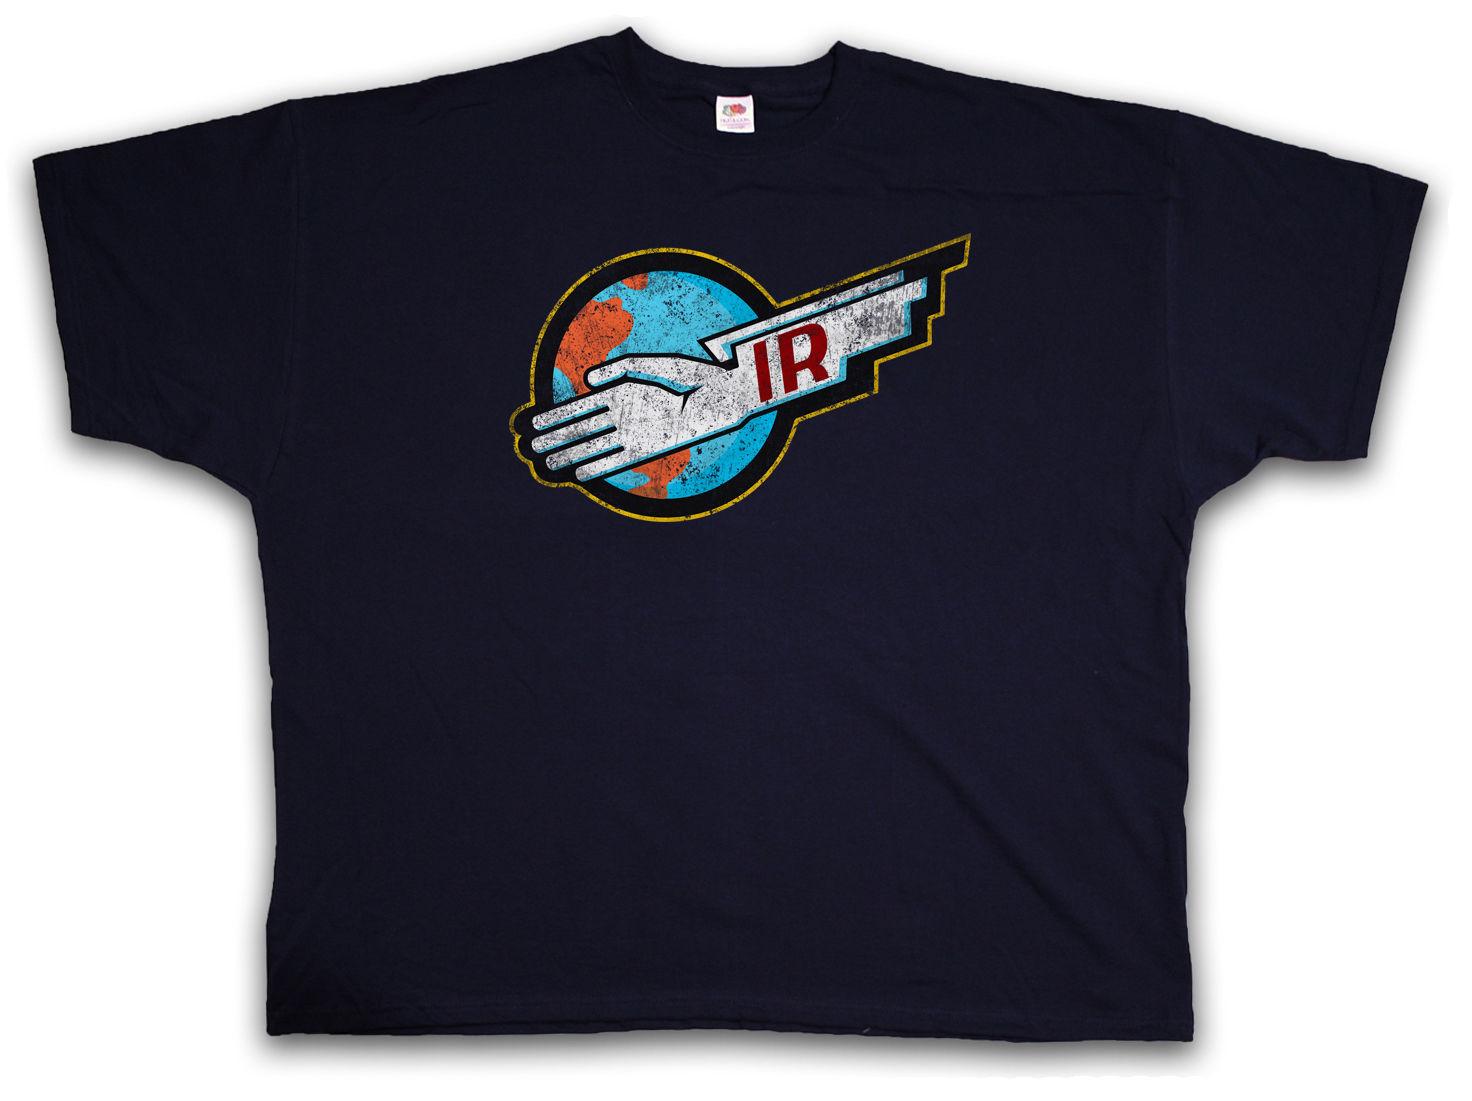 THUNDERBIRDS IR T-SHIRT - Gerry Anderson Rescue T Shirt Brand Clothes Summer 2018